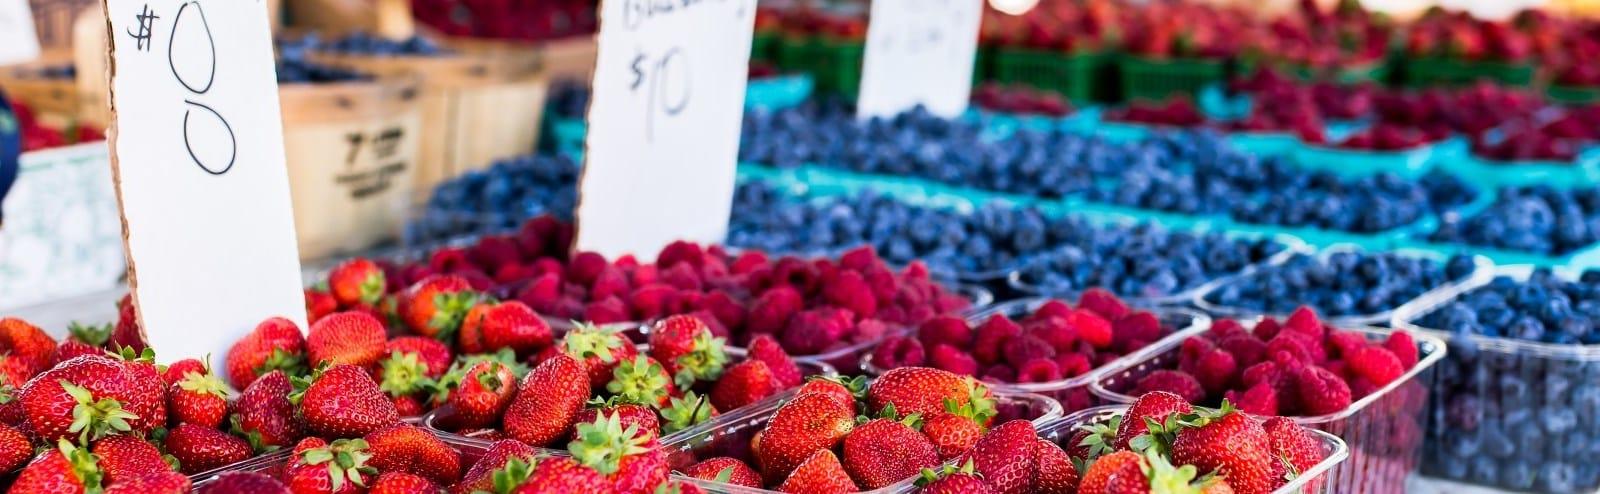 farmers market city of cambridge